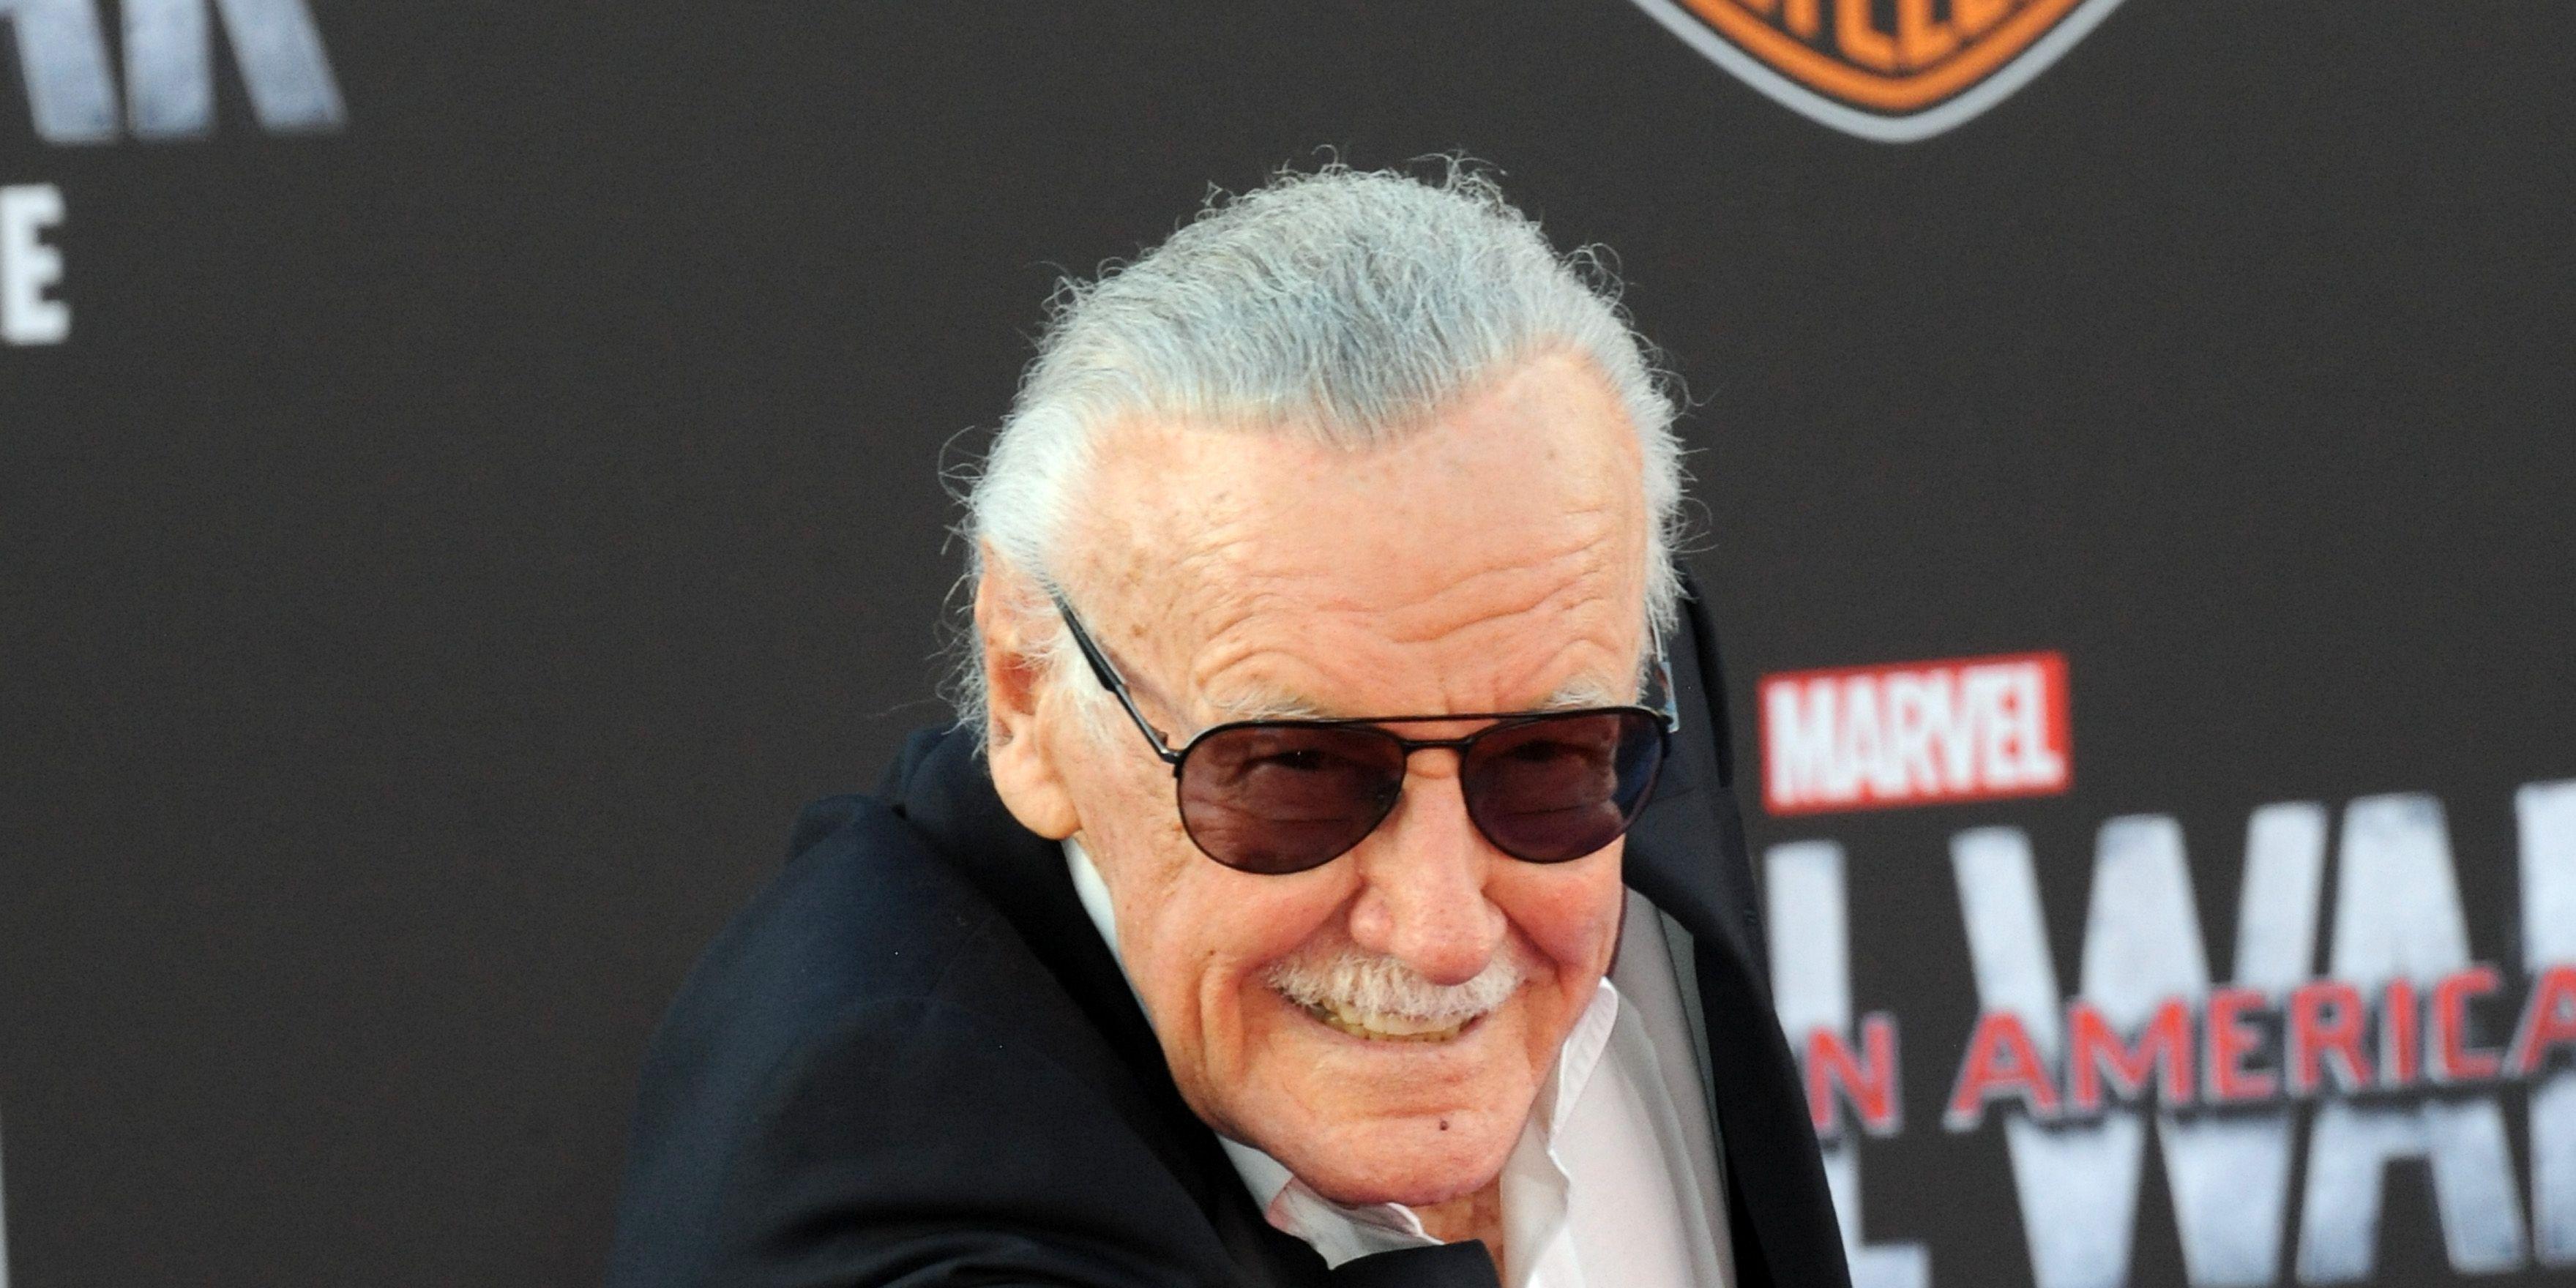 Stan Lee at Captain America premiere